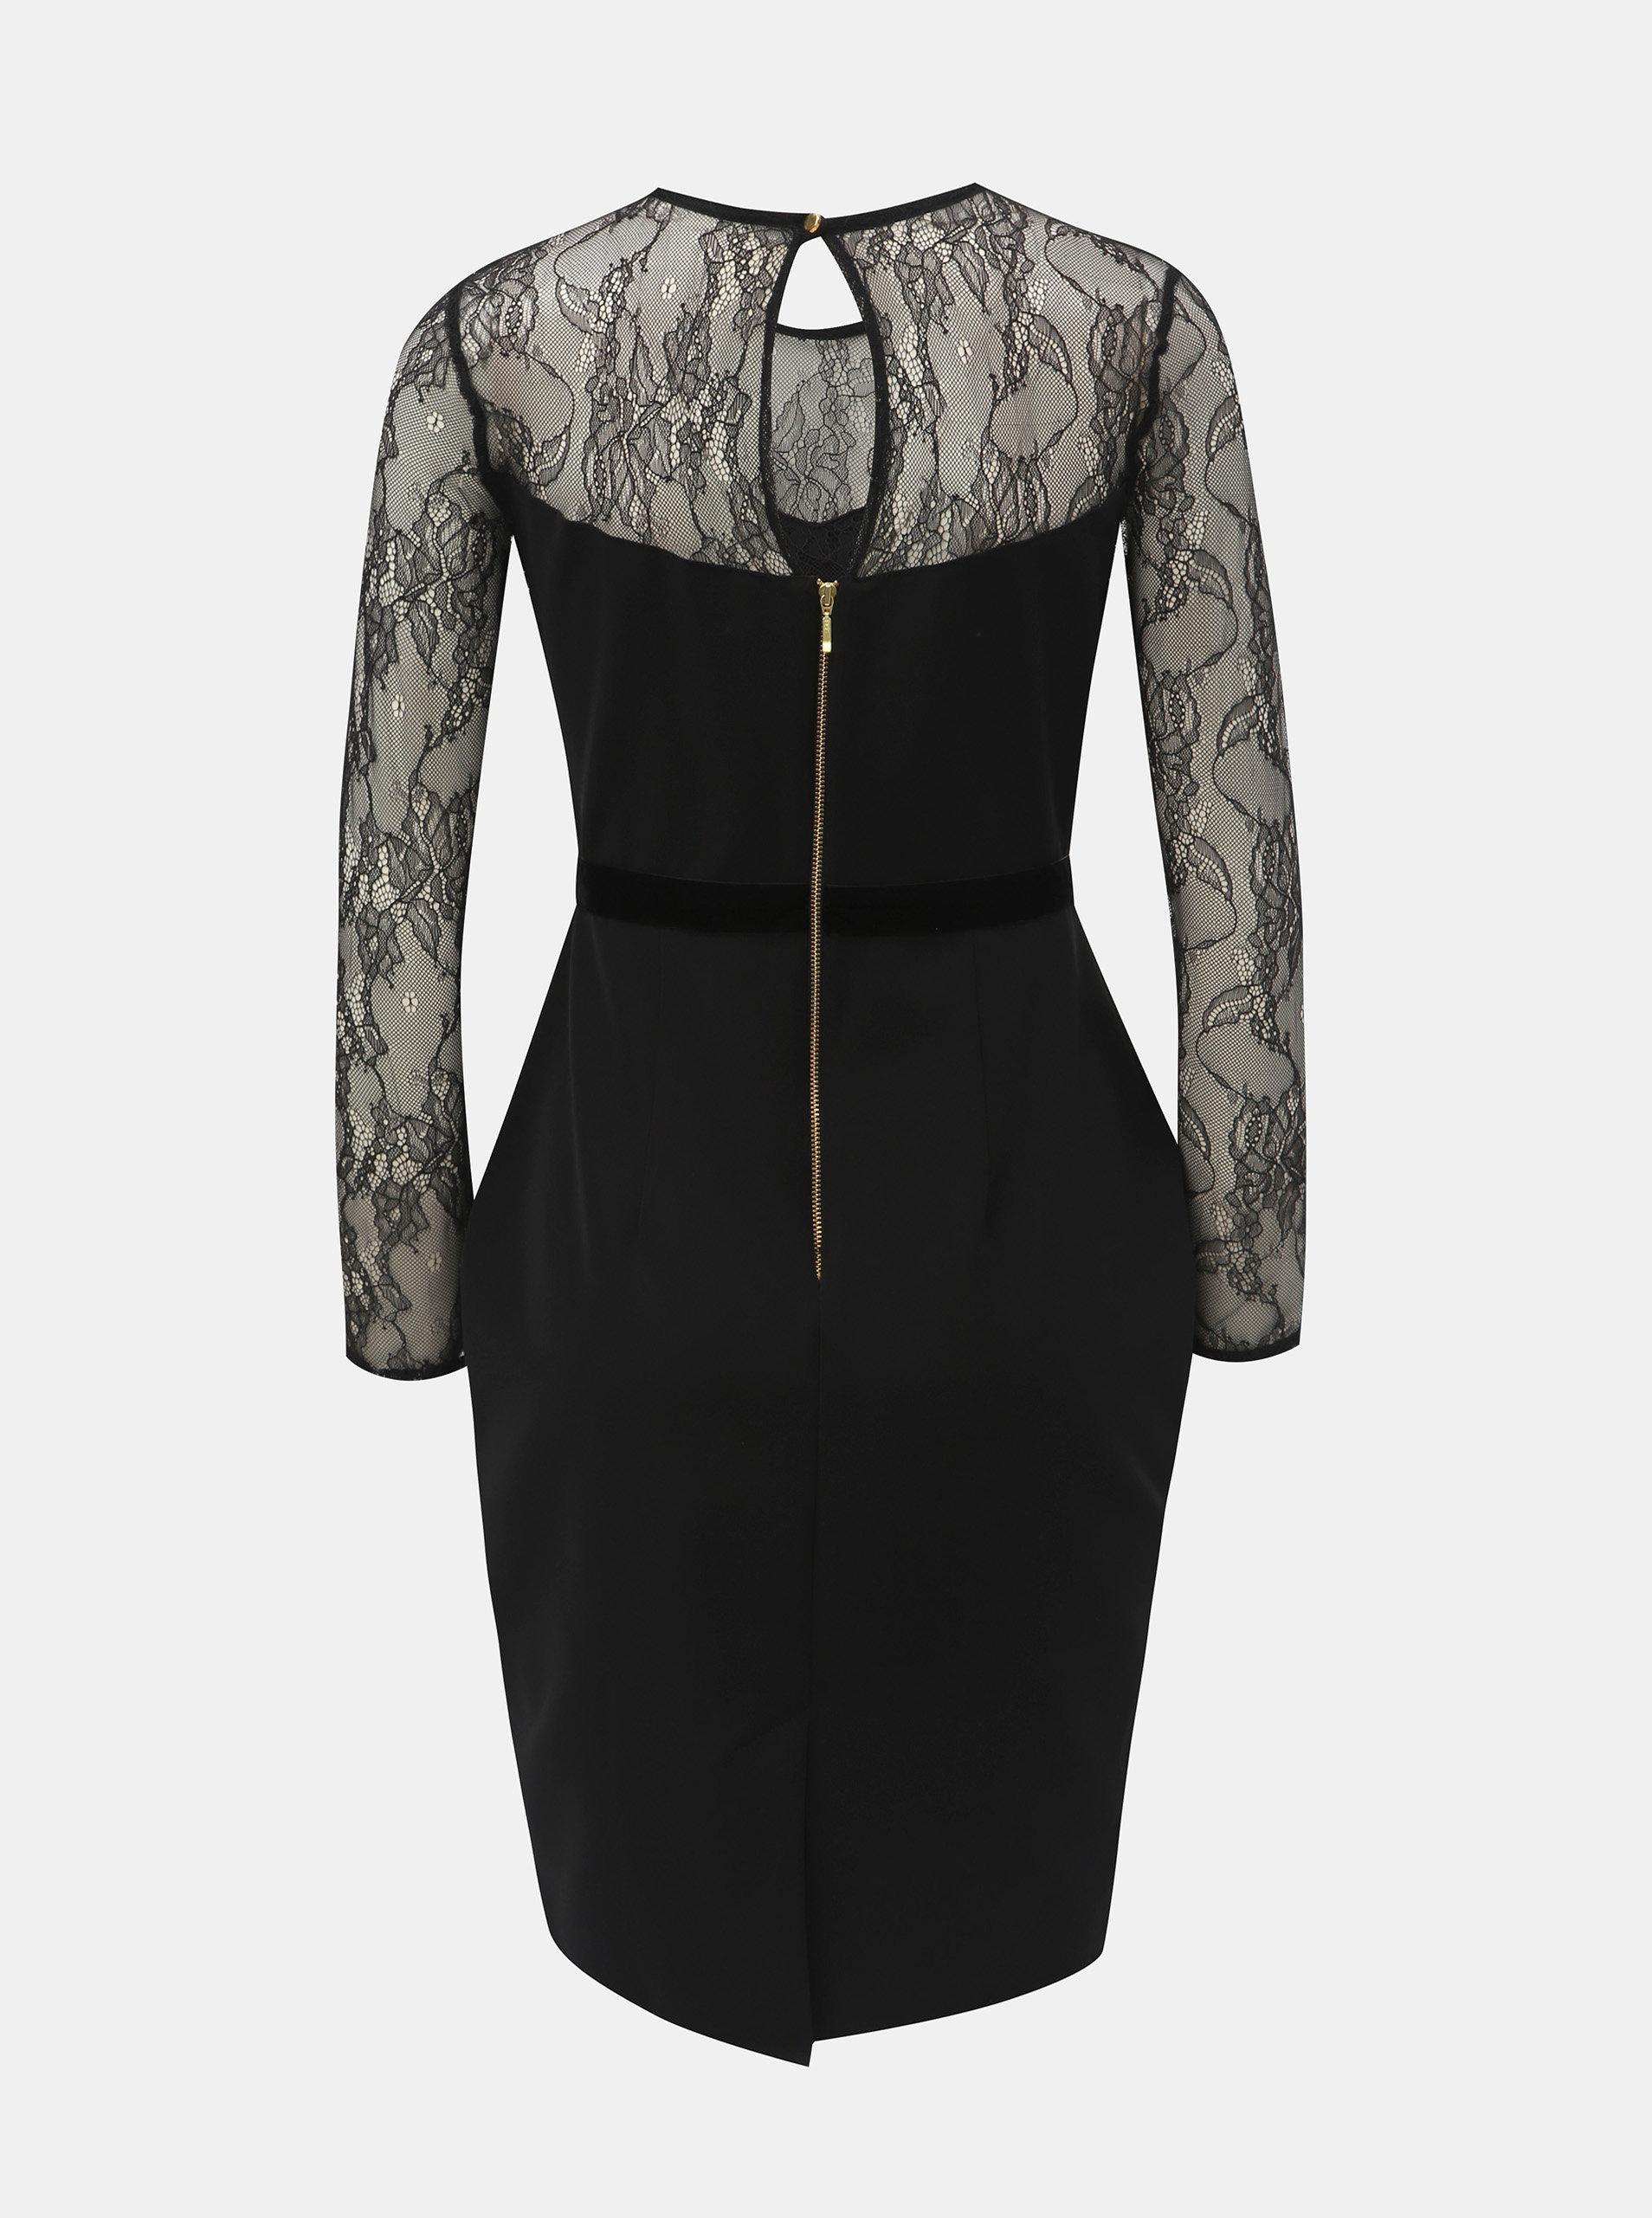 Černé pouzdrové šaty s krajkovým sedlem a rukávy Dorothy Perkins Petite ... 08b5dd3d1b